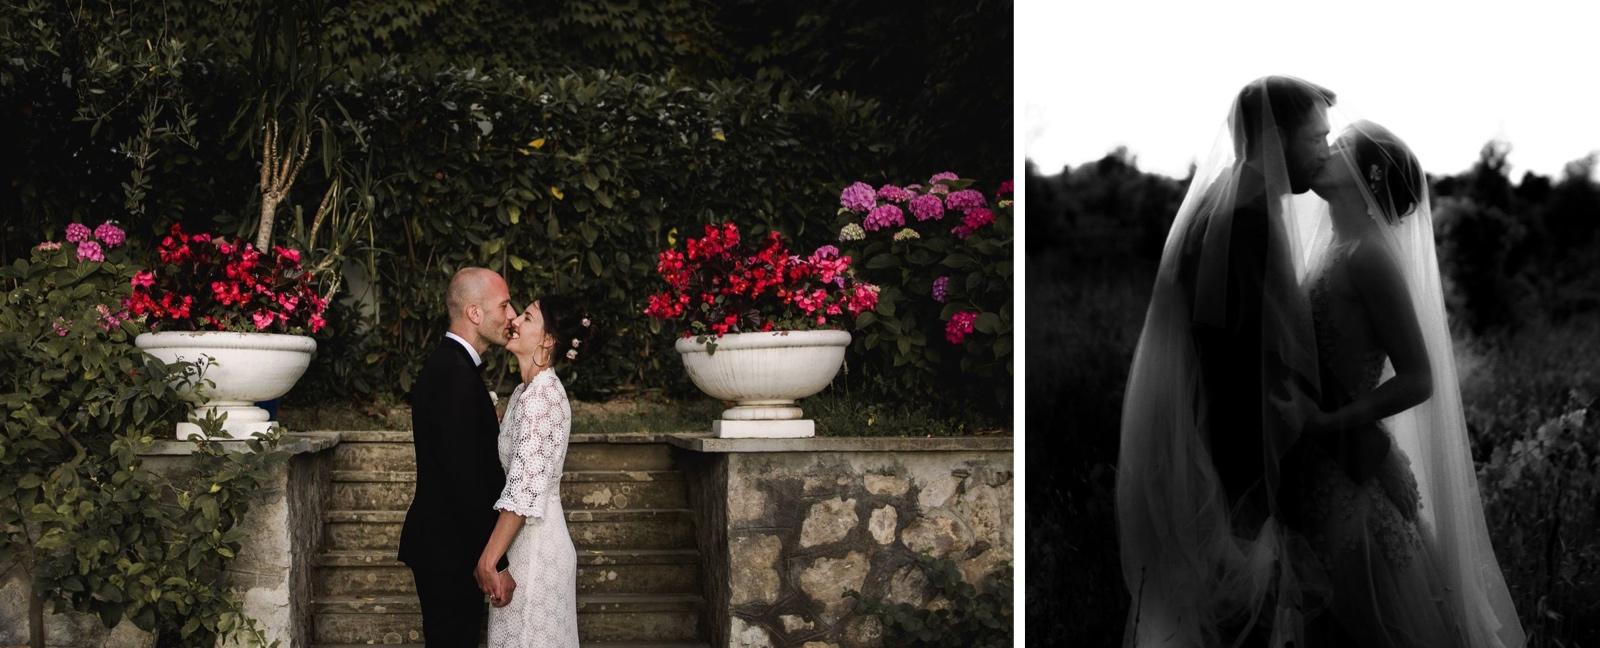 Fotomagoria Best 0f 2018 Wedding Photographer Italy33.jpg